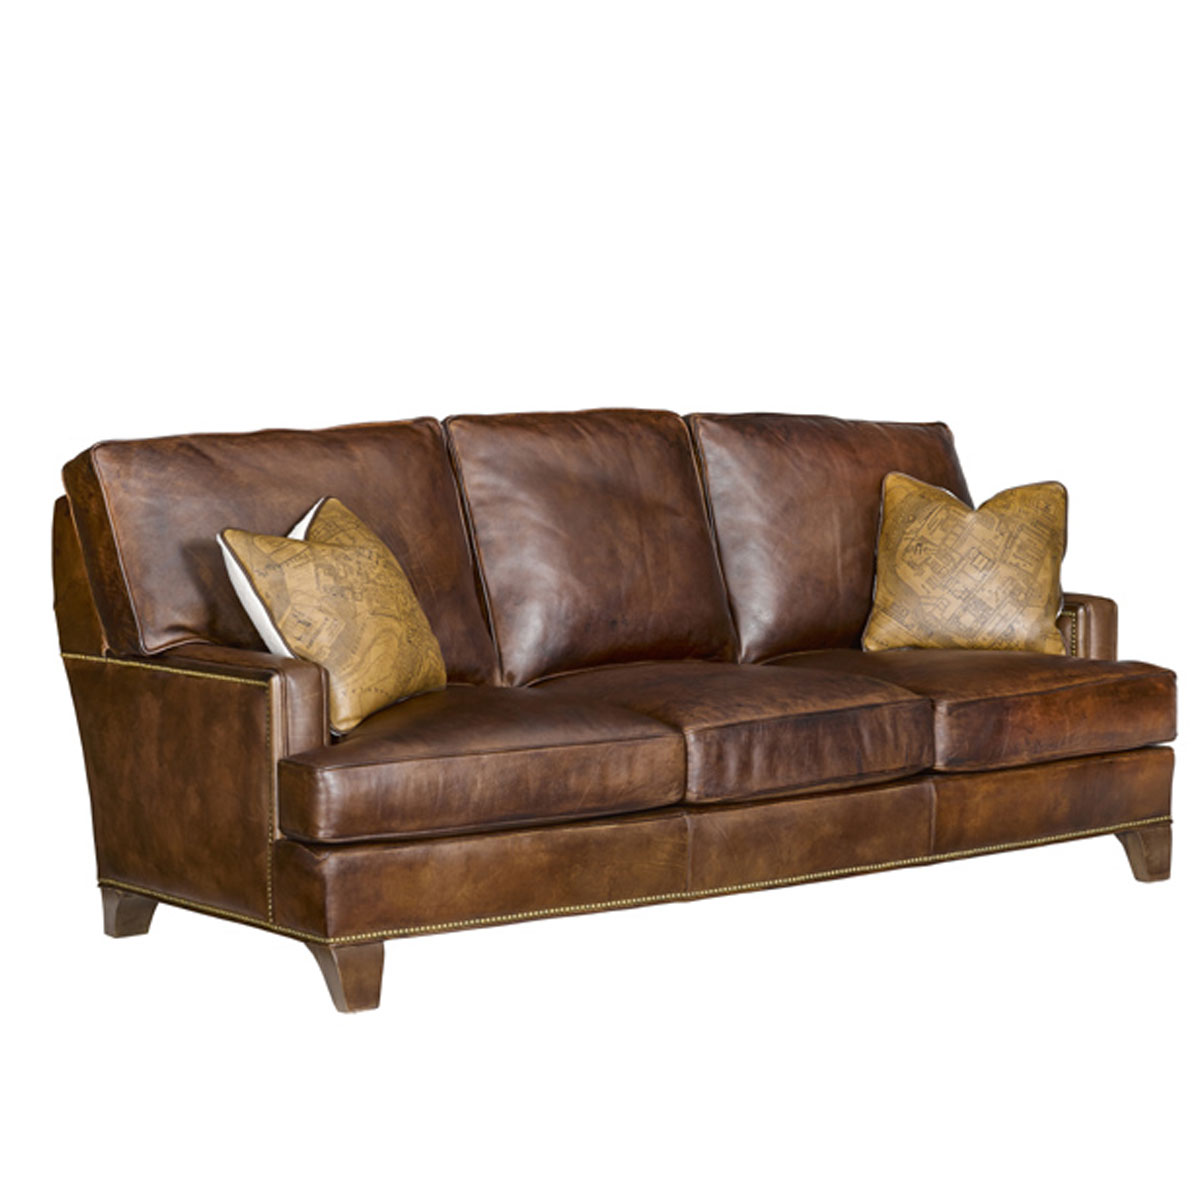 Super Leathercraft Chase Ryan 1880 Waco Sofa Ohio Hardwood Furniture Evergreenethics Interior Chair Design Evergreenethicsorg